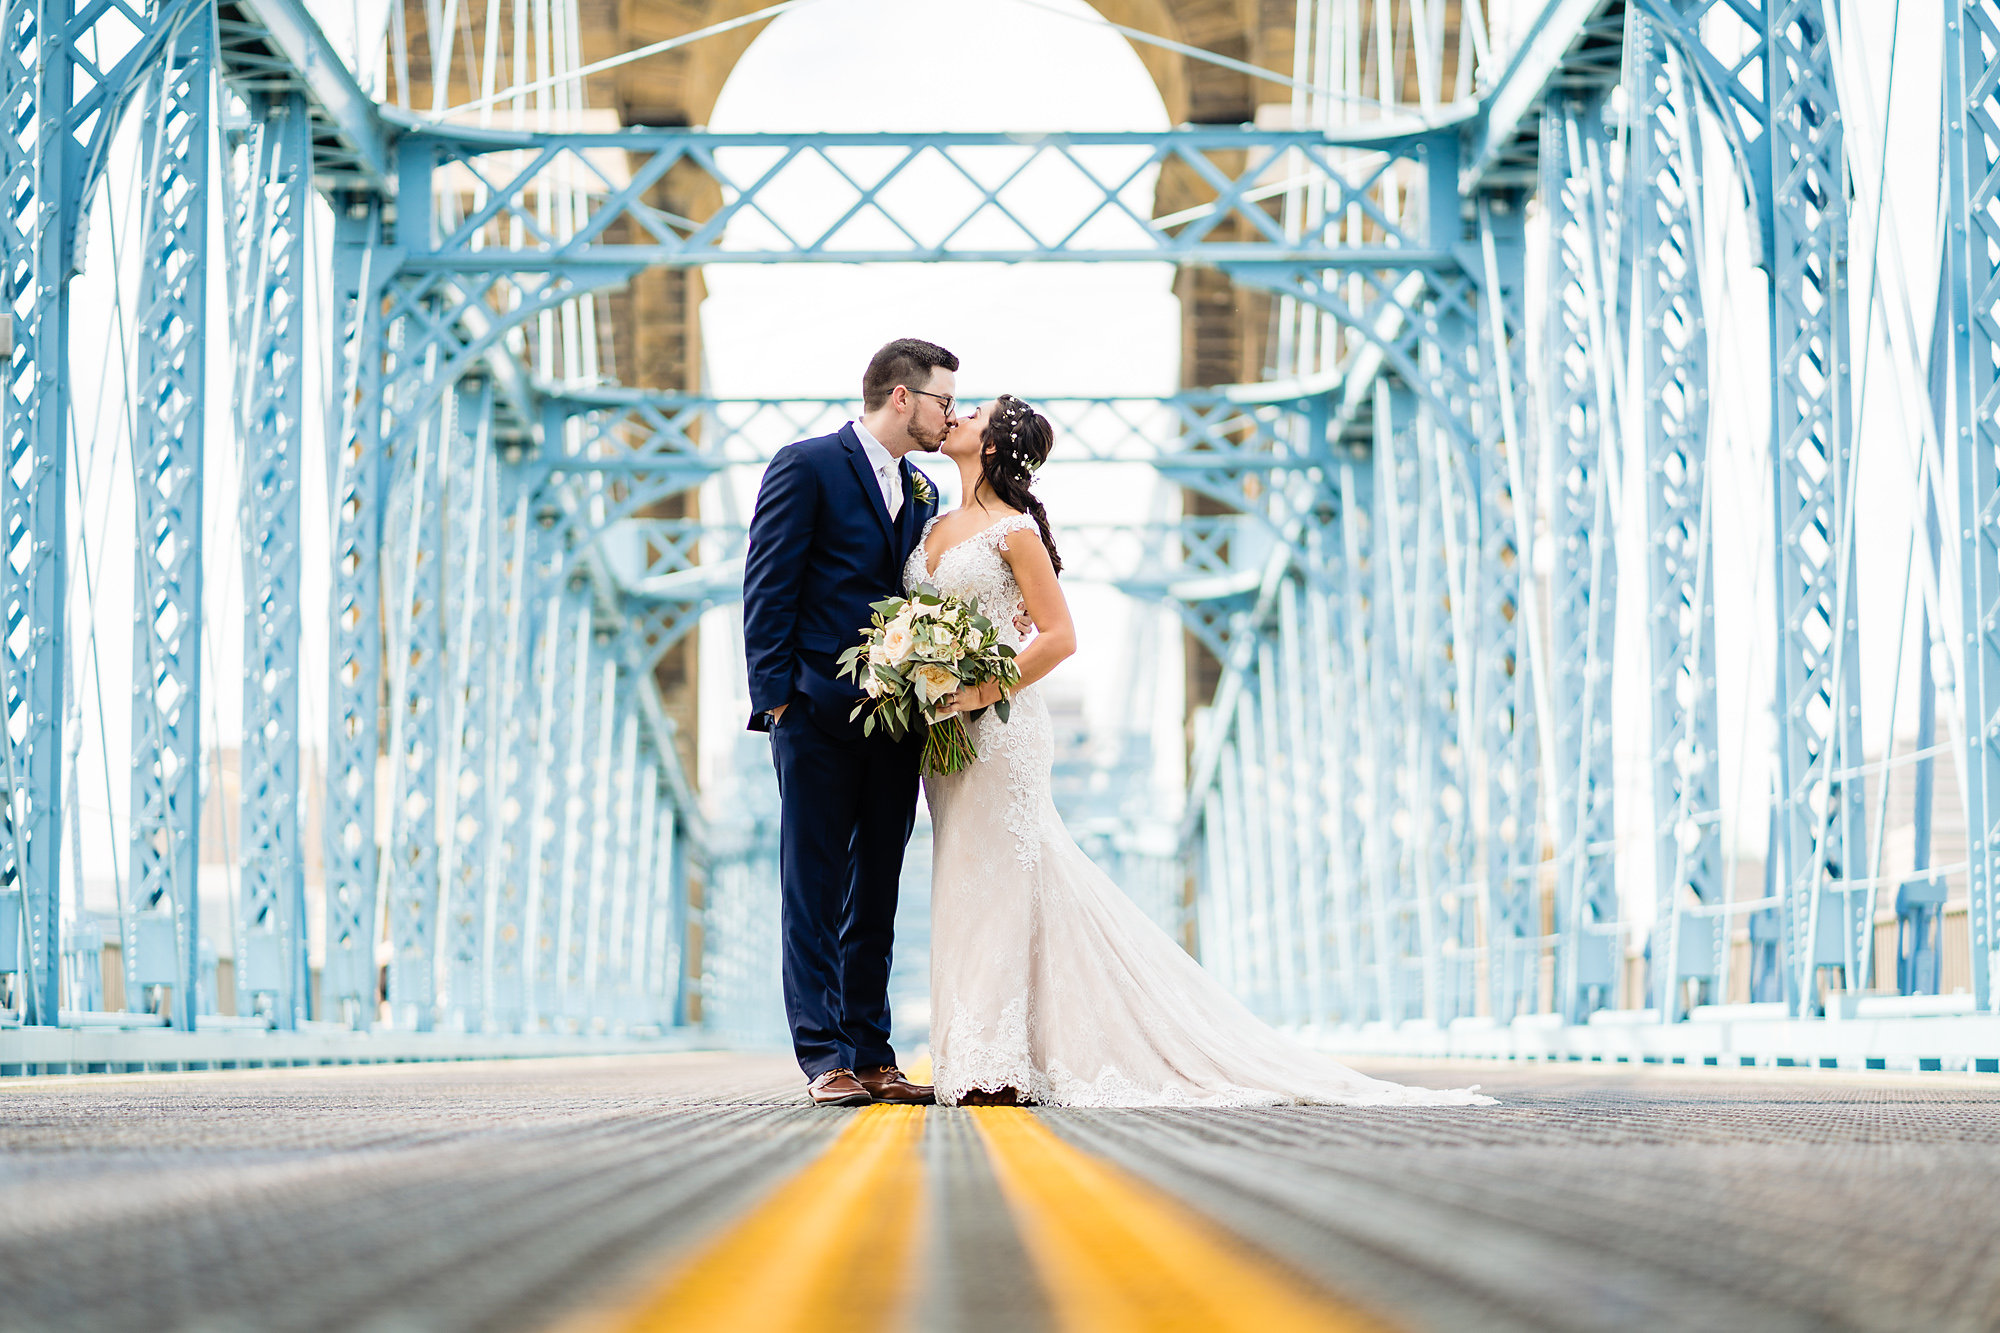 Embassy-Suites-Rivercenter-Wedding-Photography-14.jpg